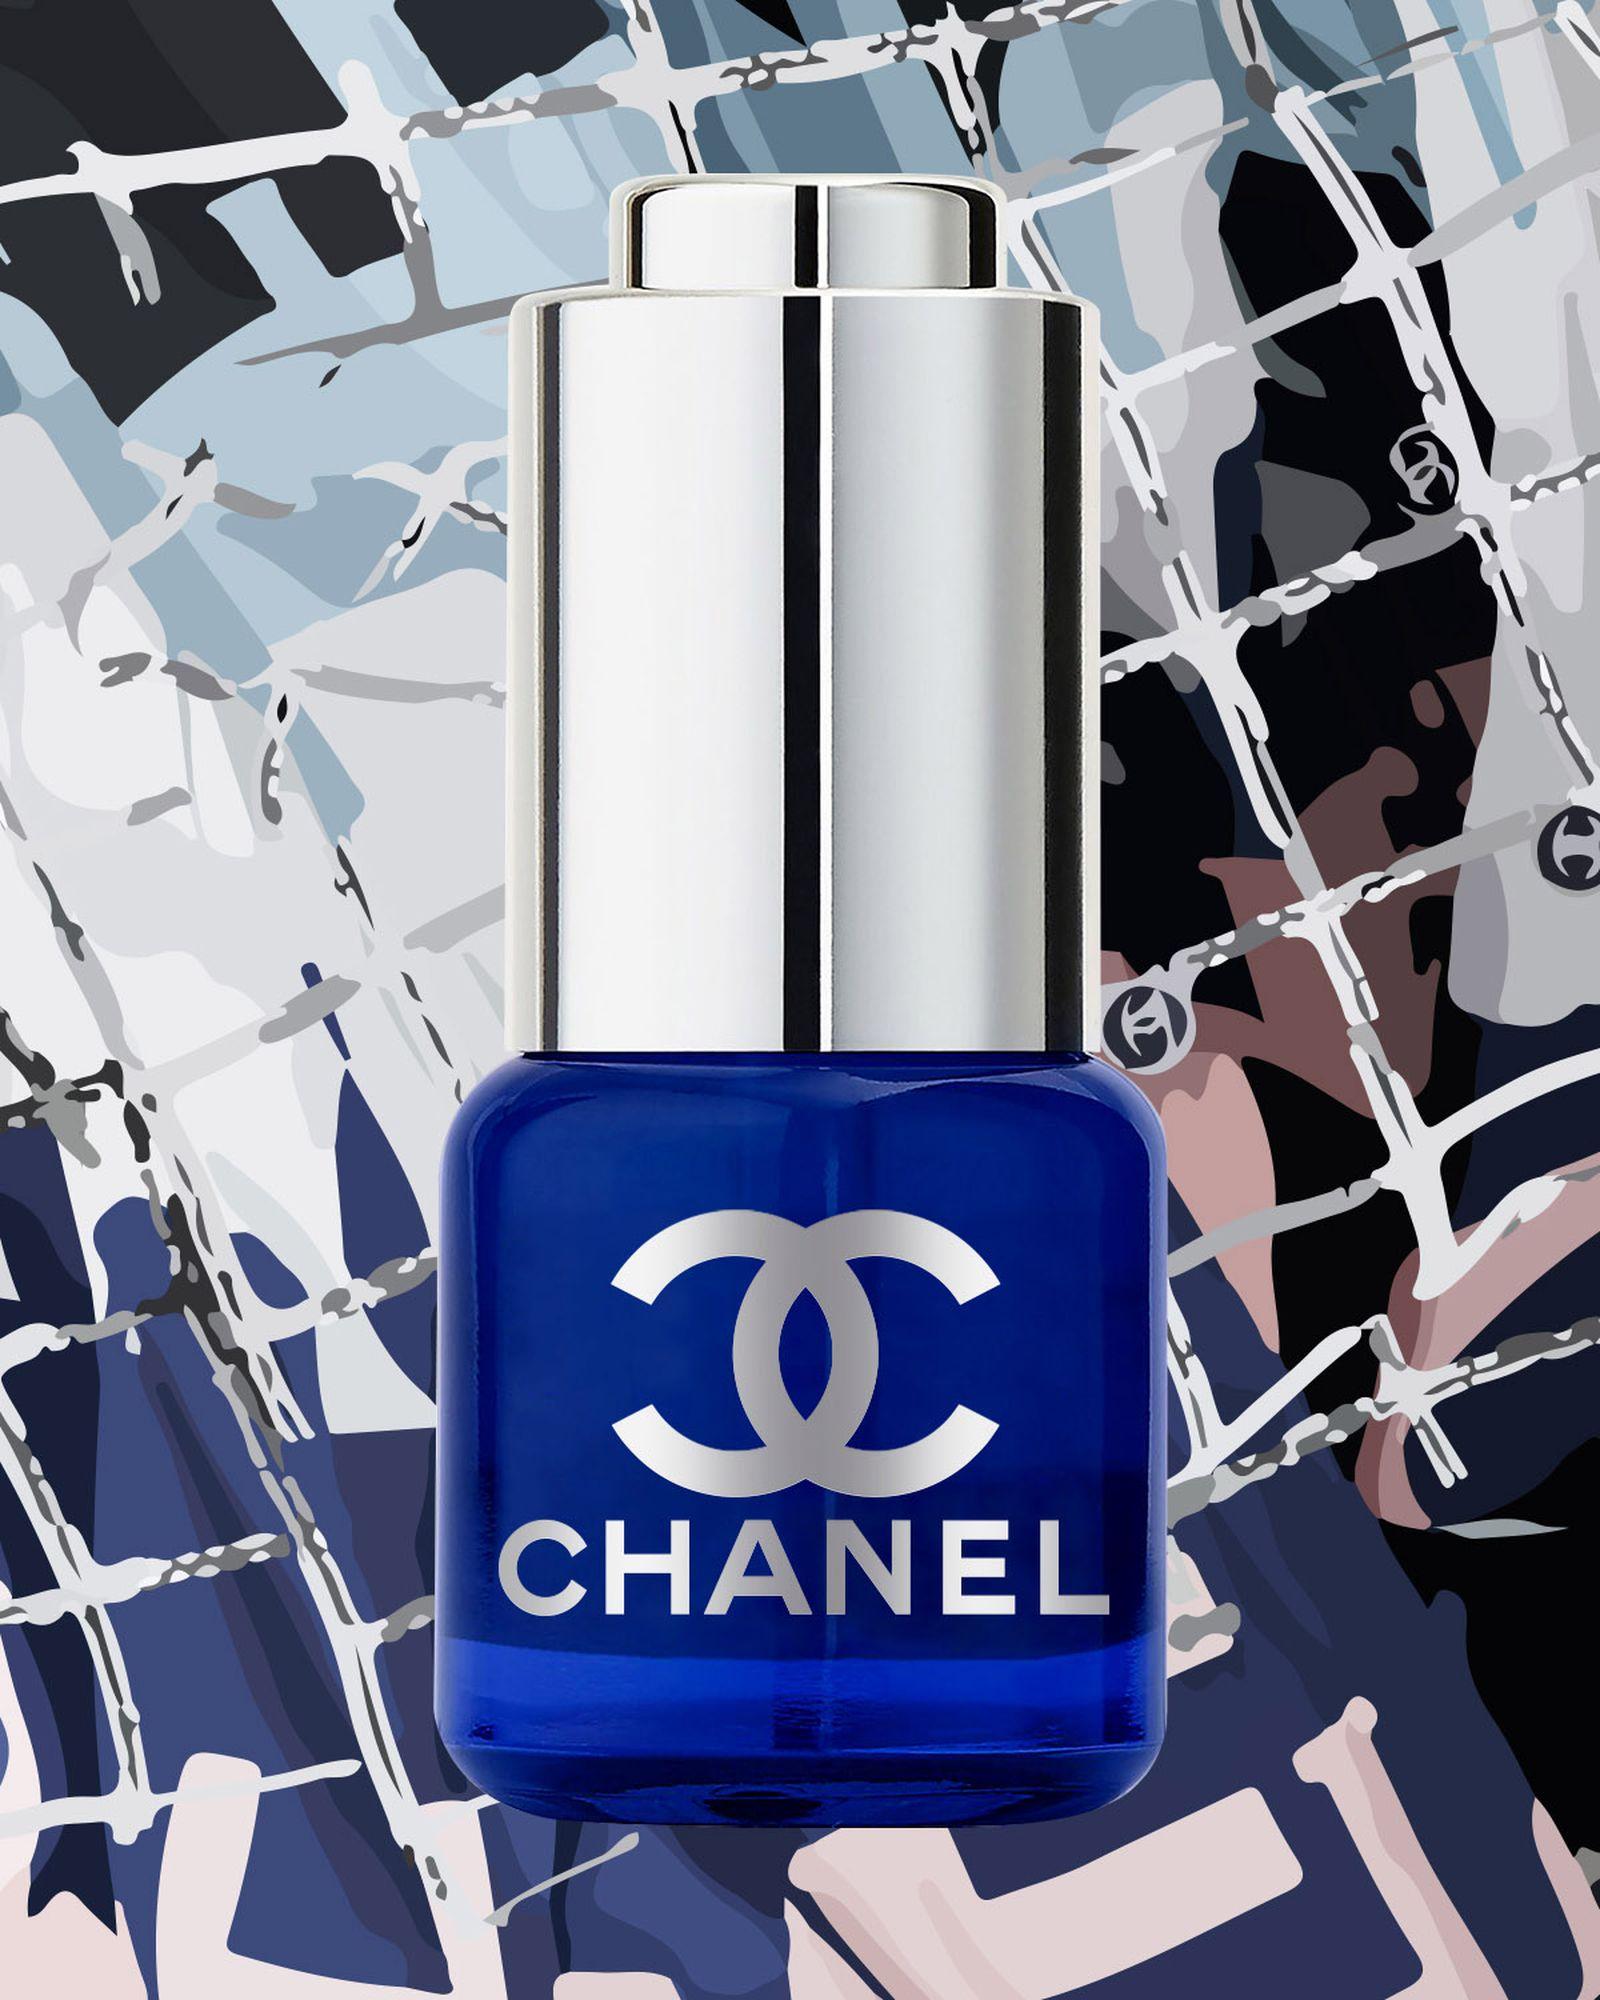 skincare-fashion-brands-Chanel_La Prairie_1200x1500_dev02